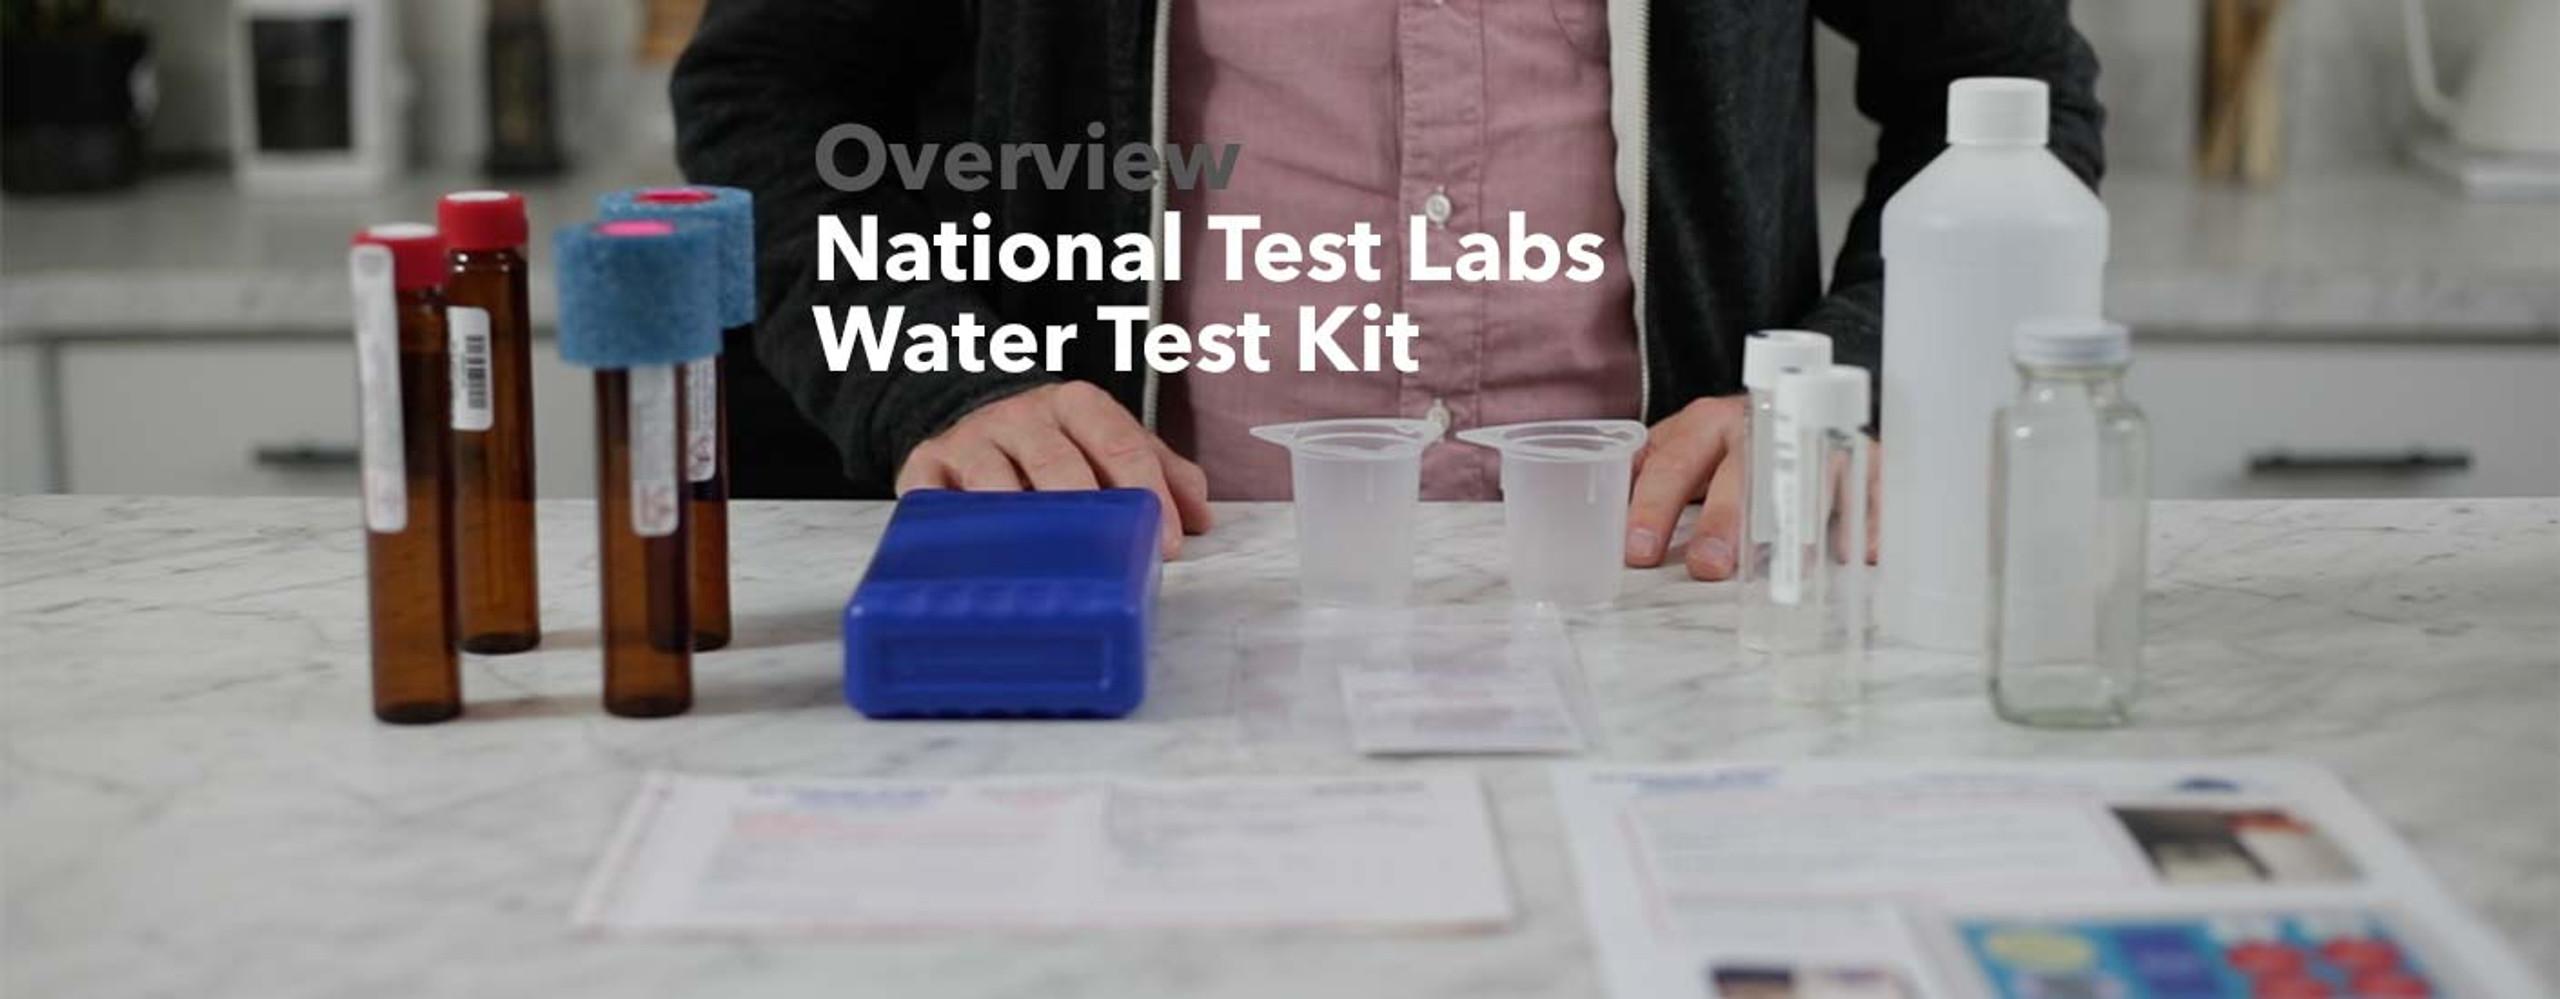 National Test Labs Kit